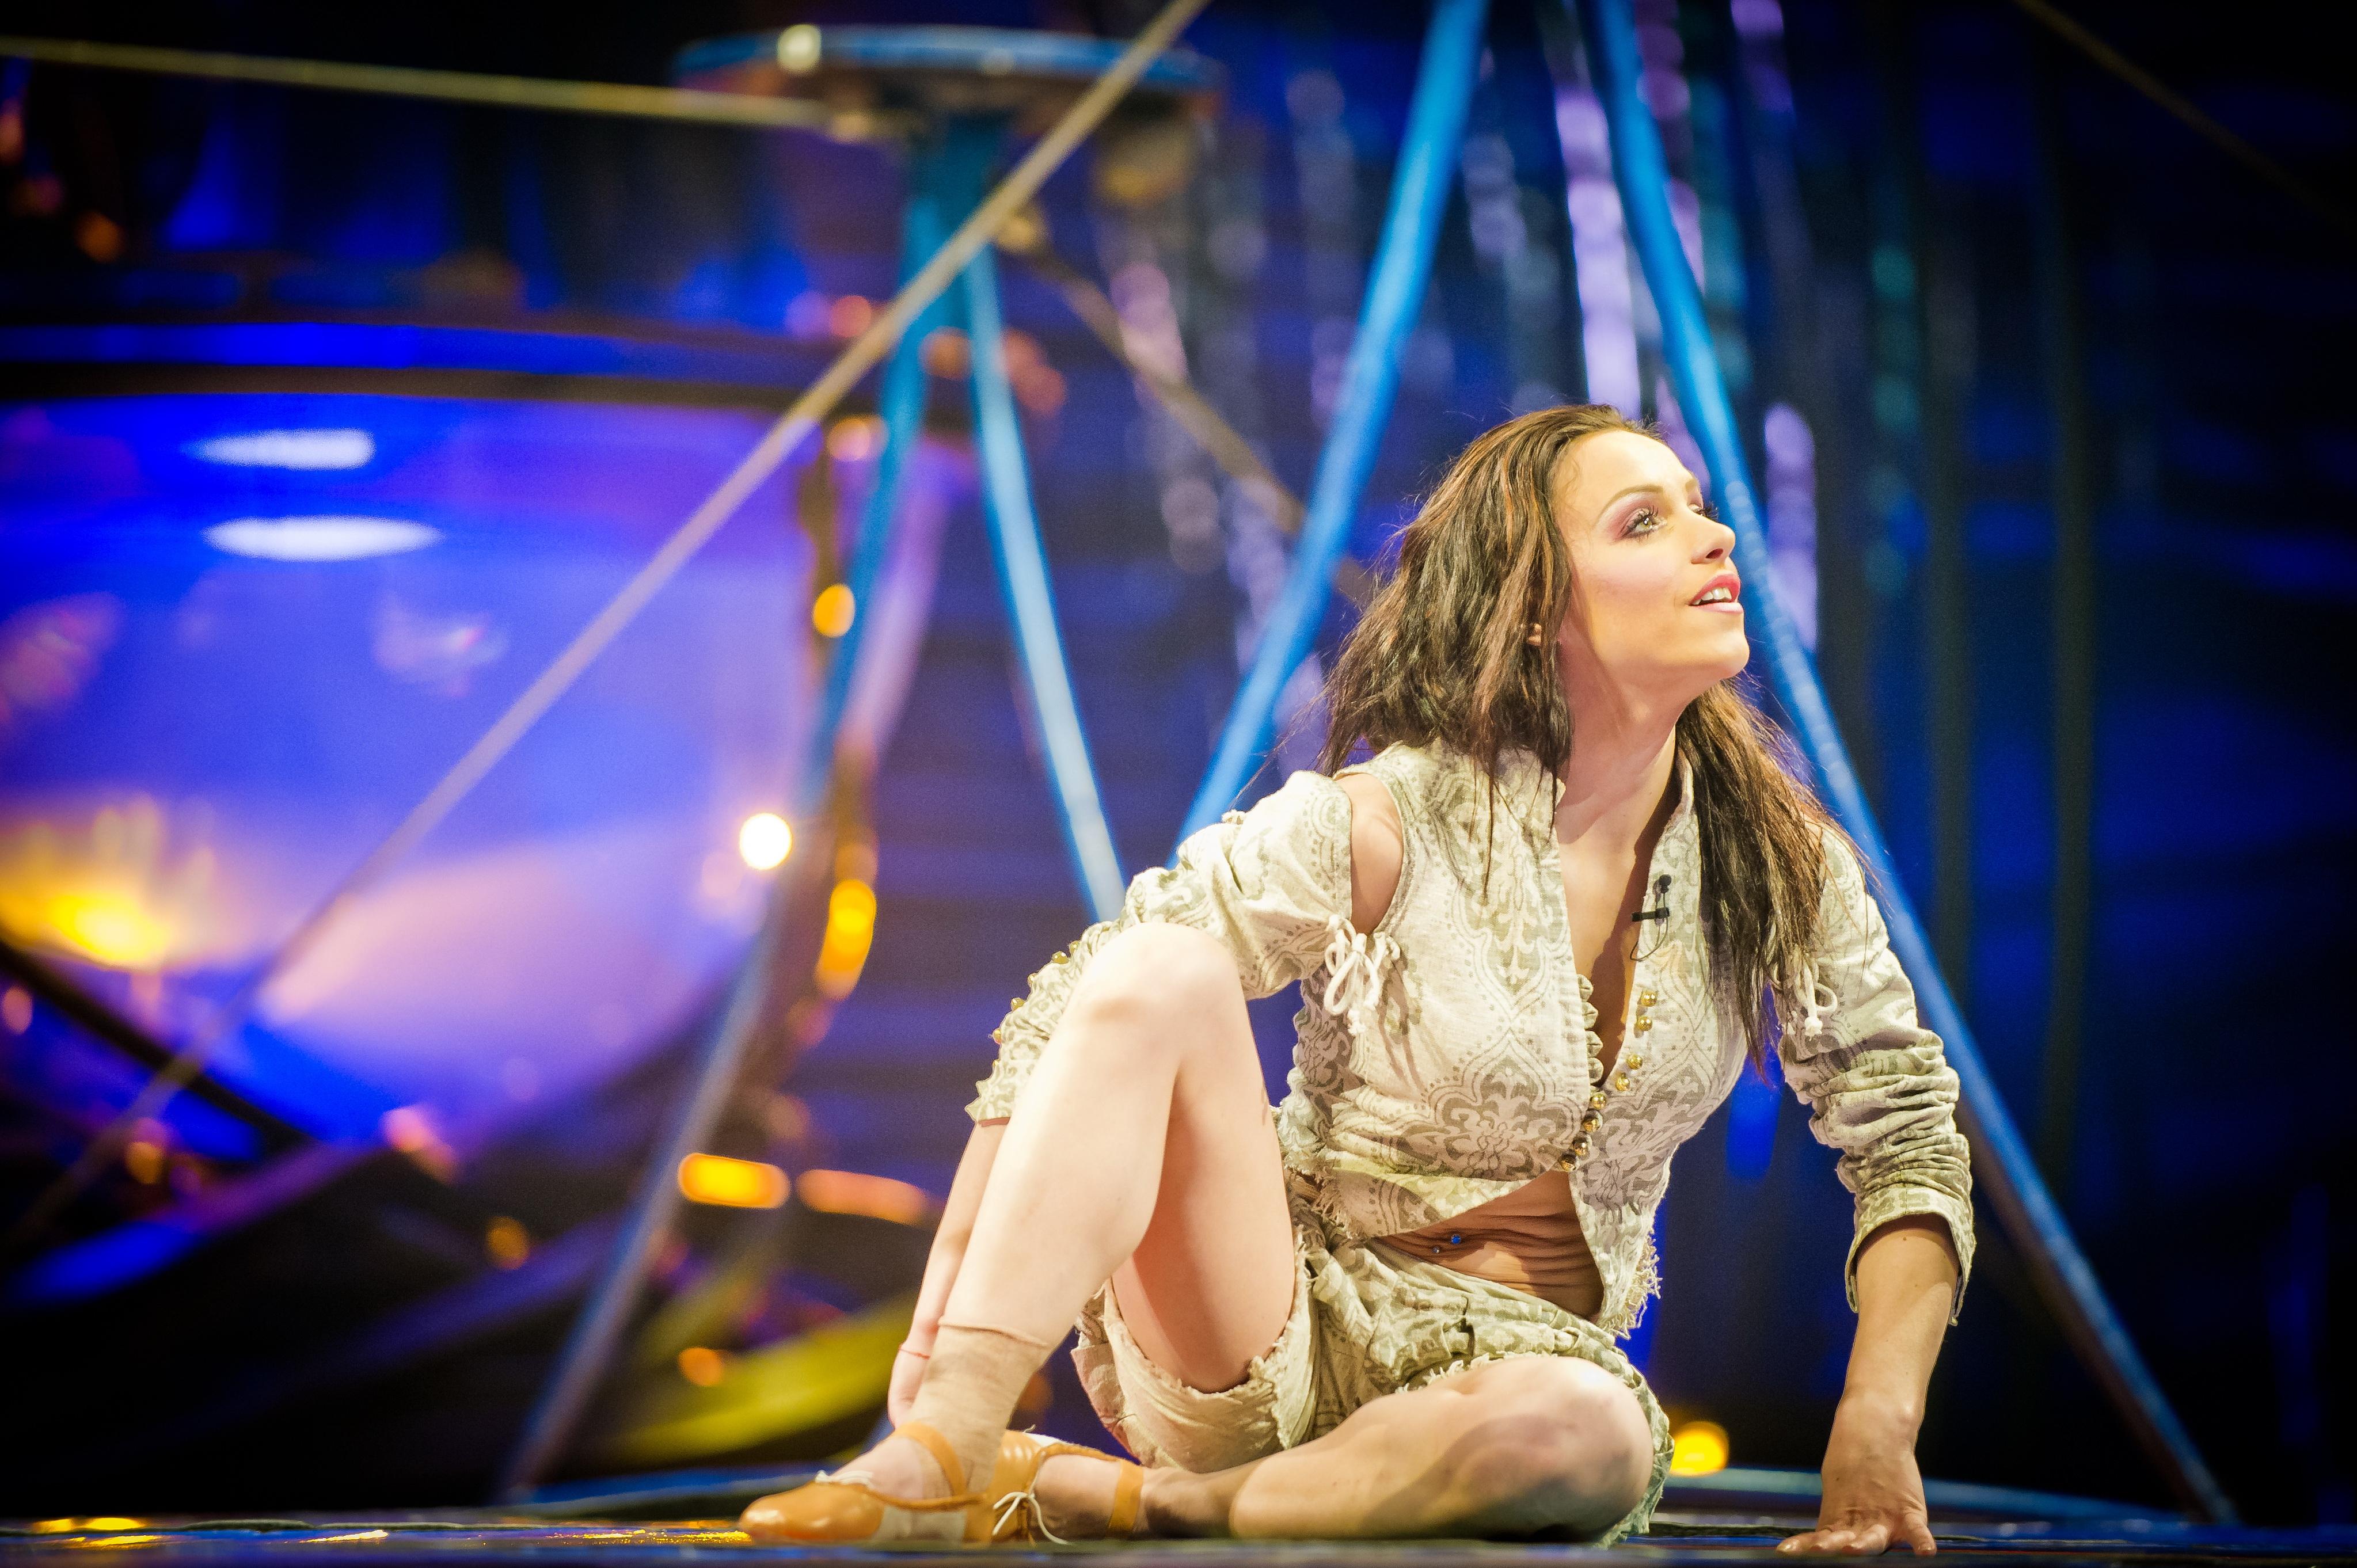 Cirque du Soleil enchants with 'Amaluna' (Photos)